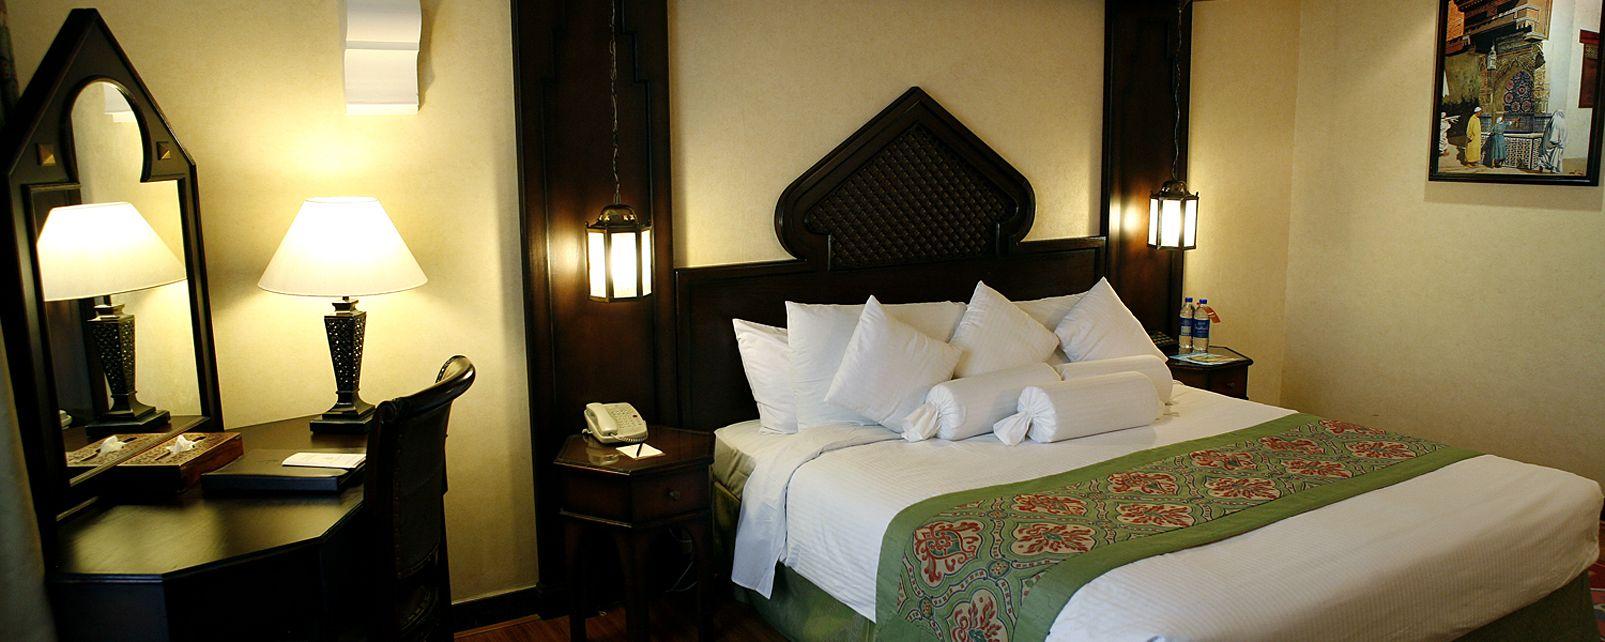 Hotel Arabian Courtyard